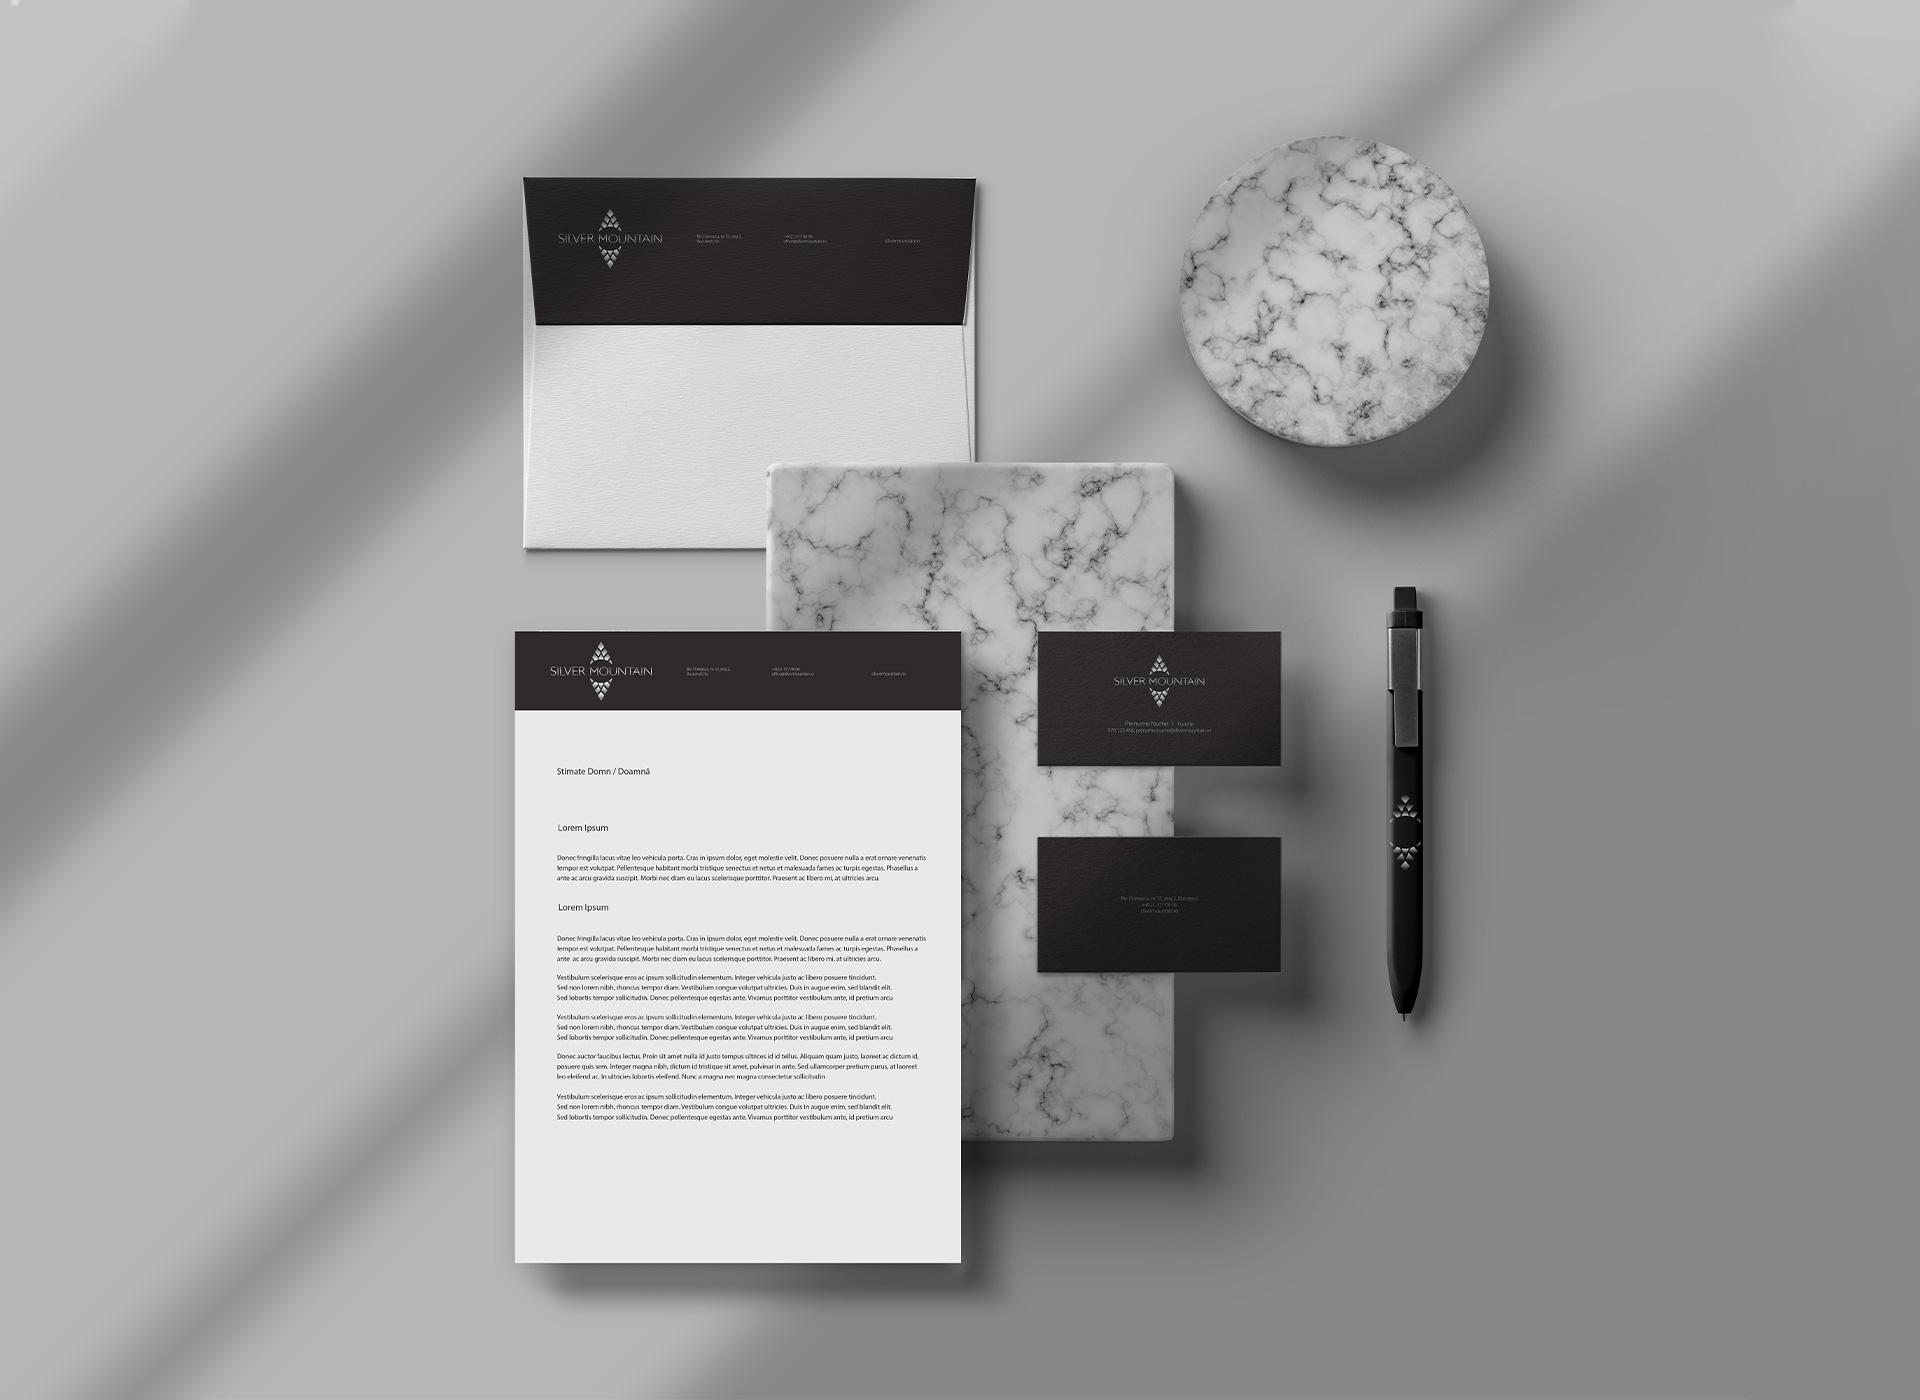 Silver Mountain portfolio inoveo stationery